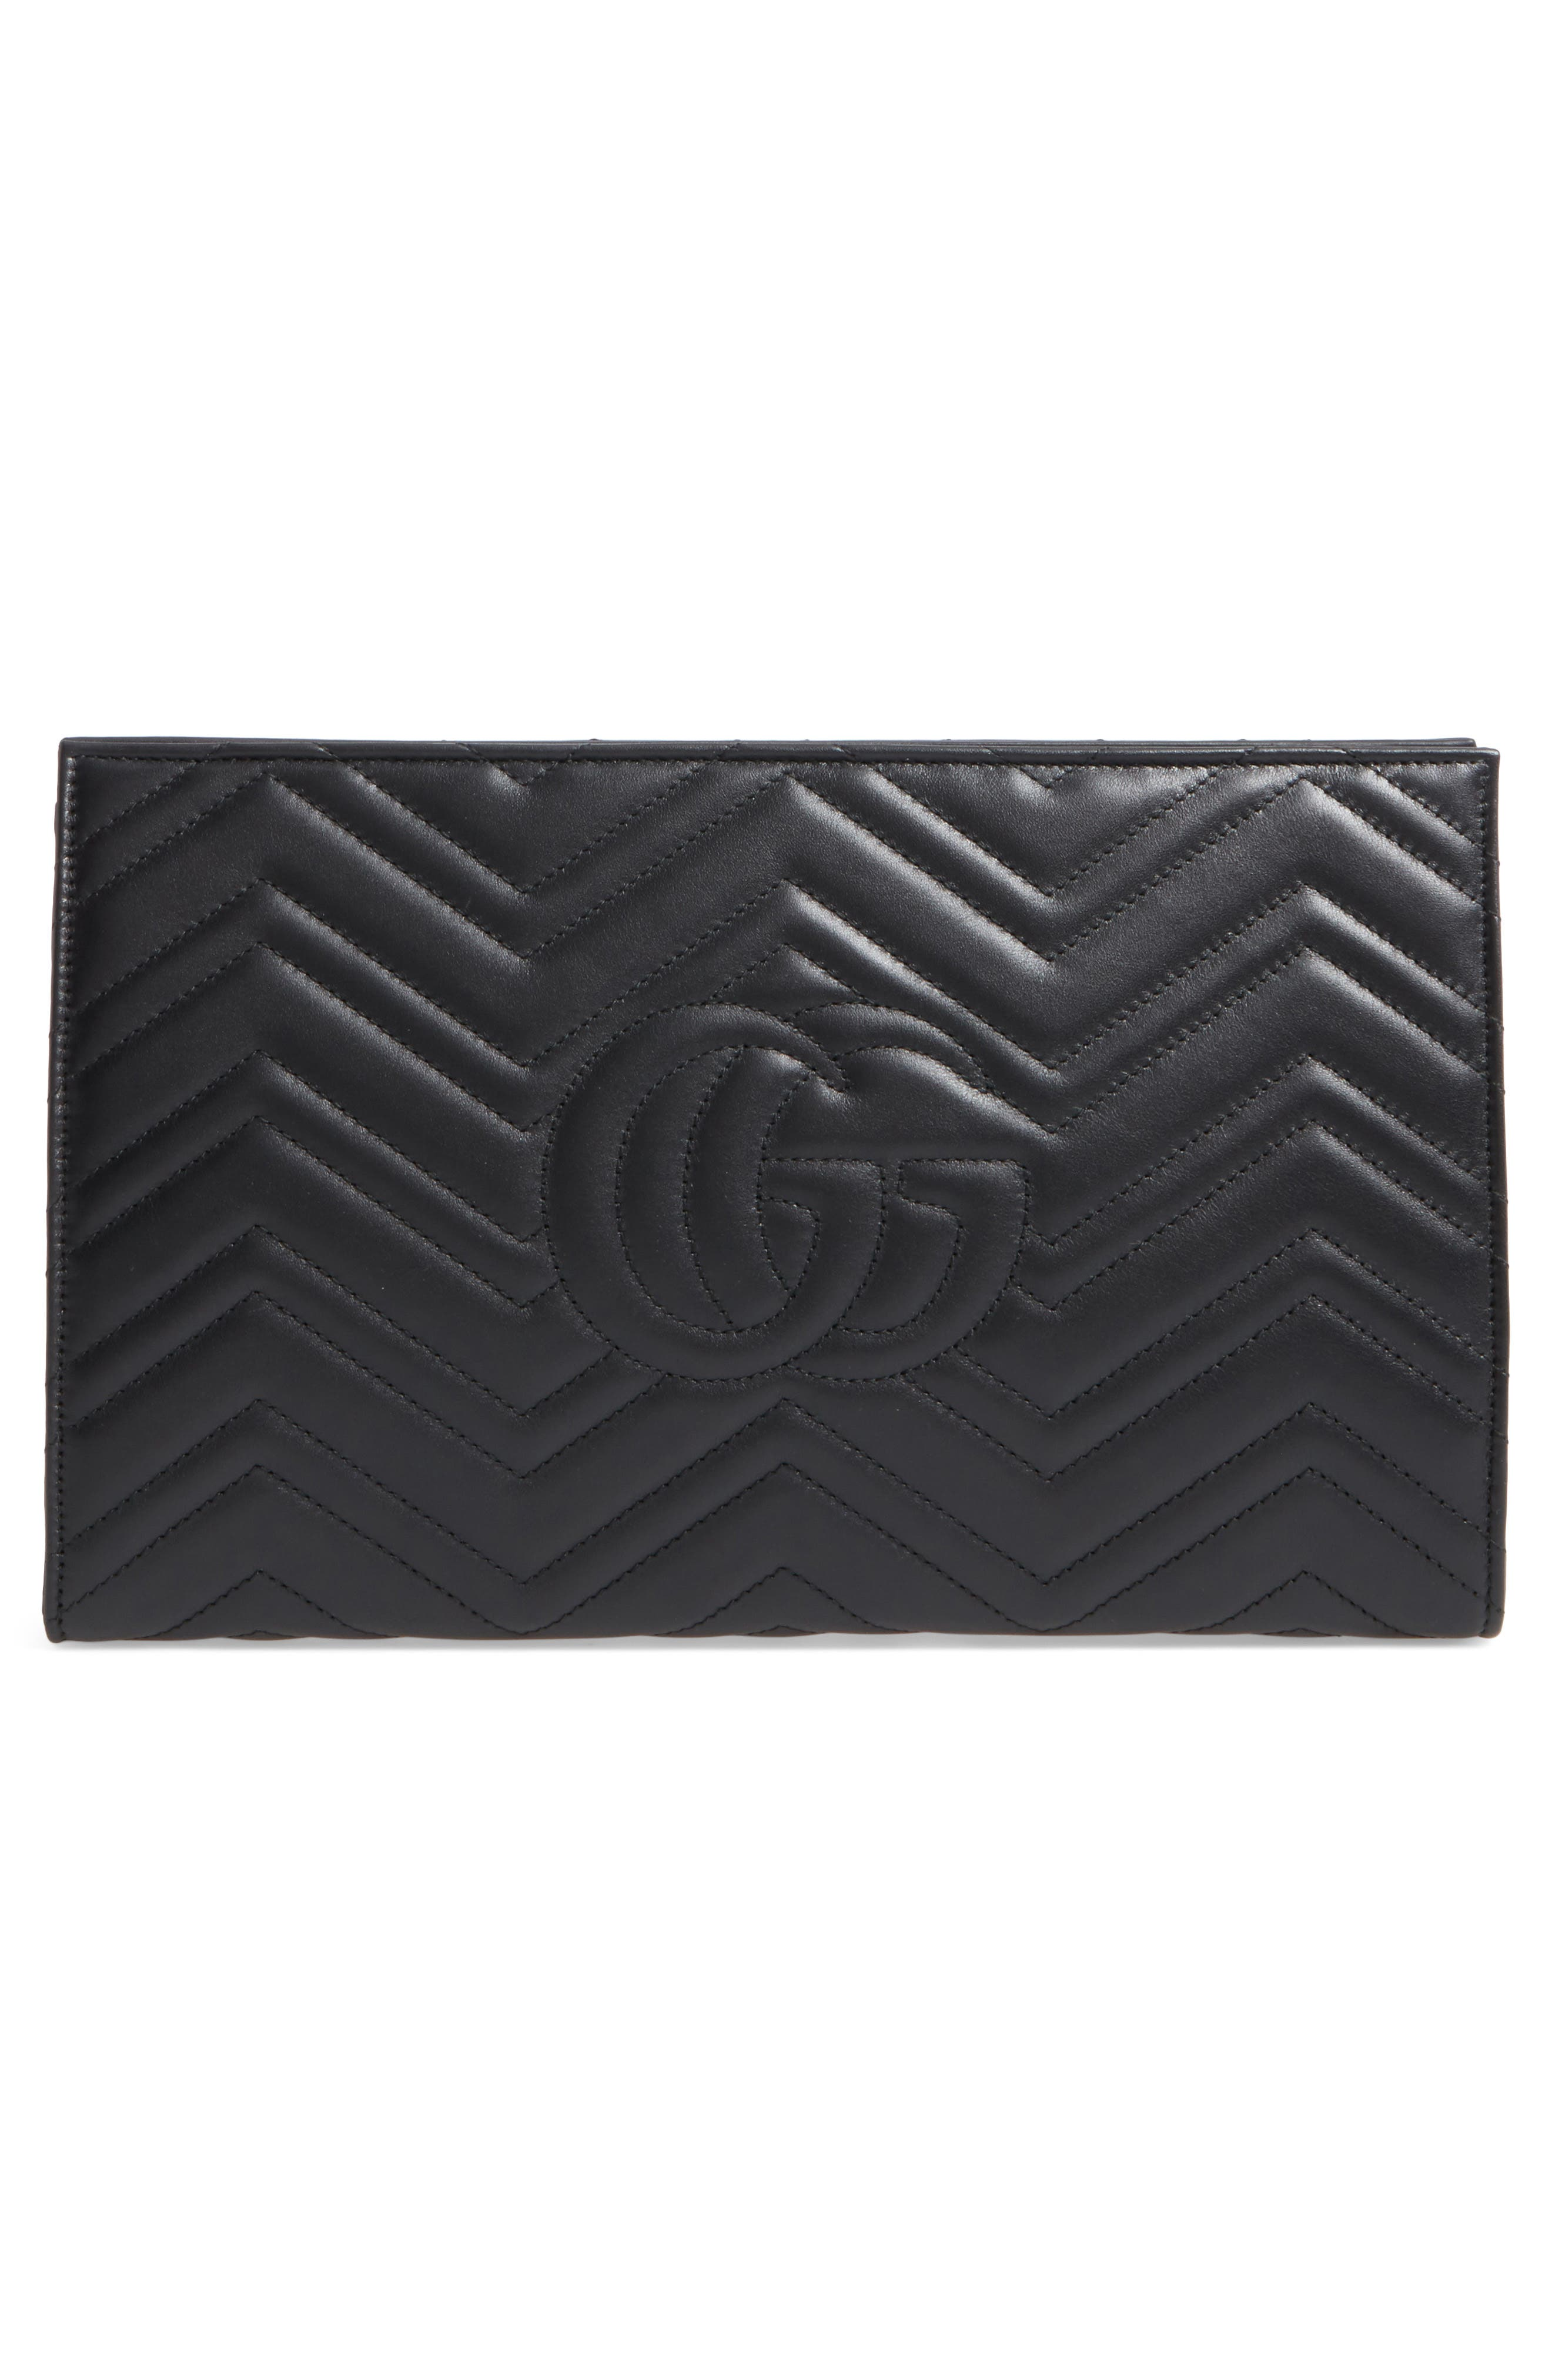 Alternate Image 3  - Gucci GG Marmont Matelassé Leather Clutch